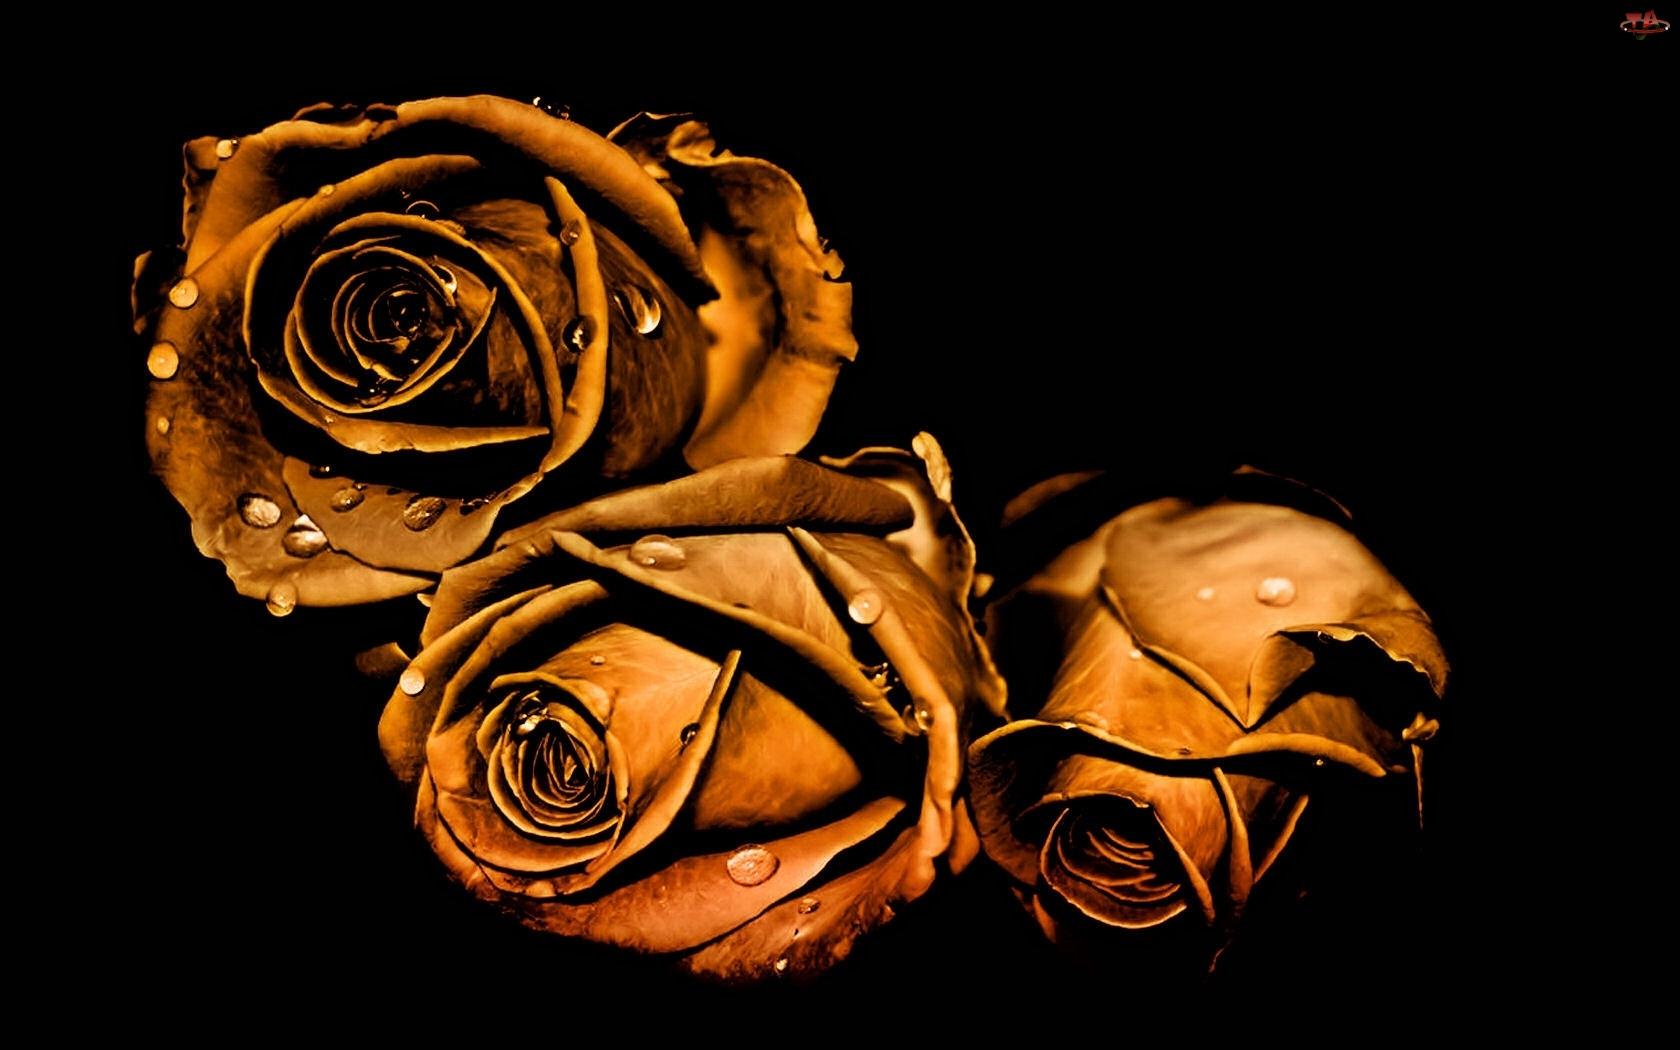 Wody, Róże, Krople